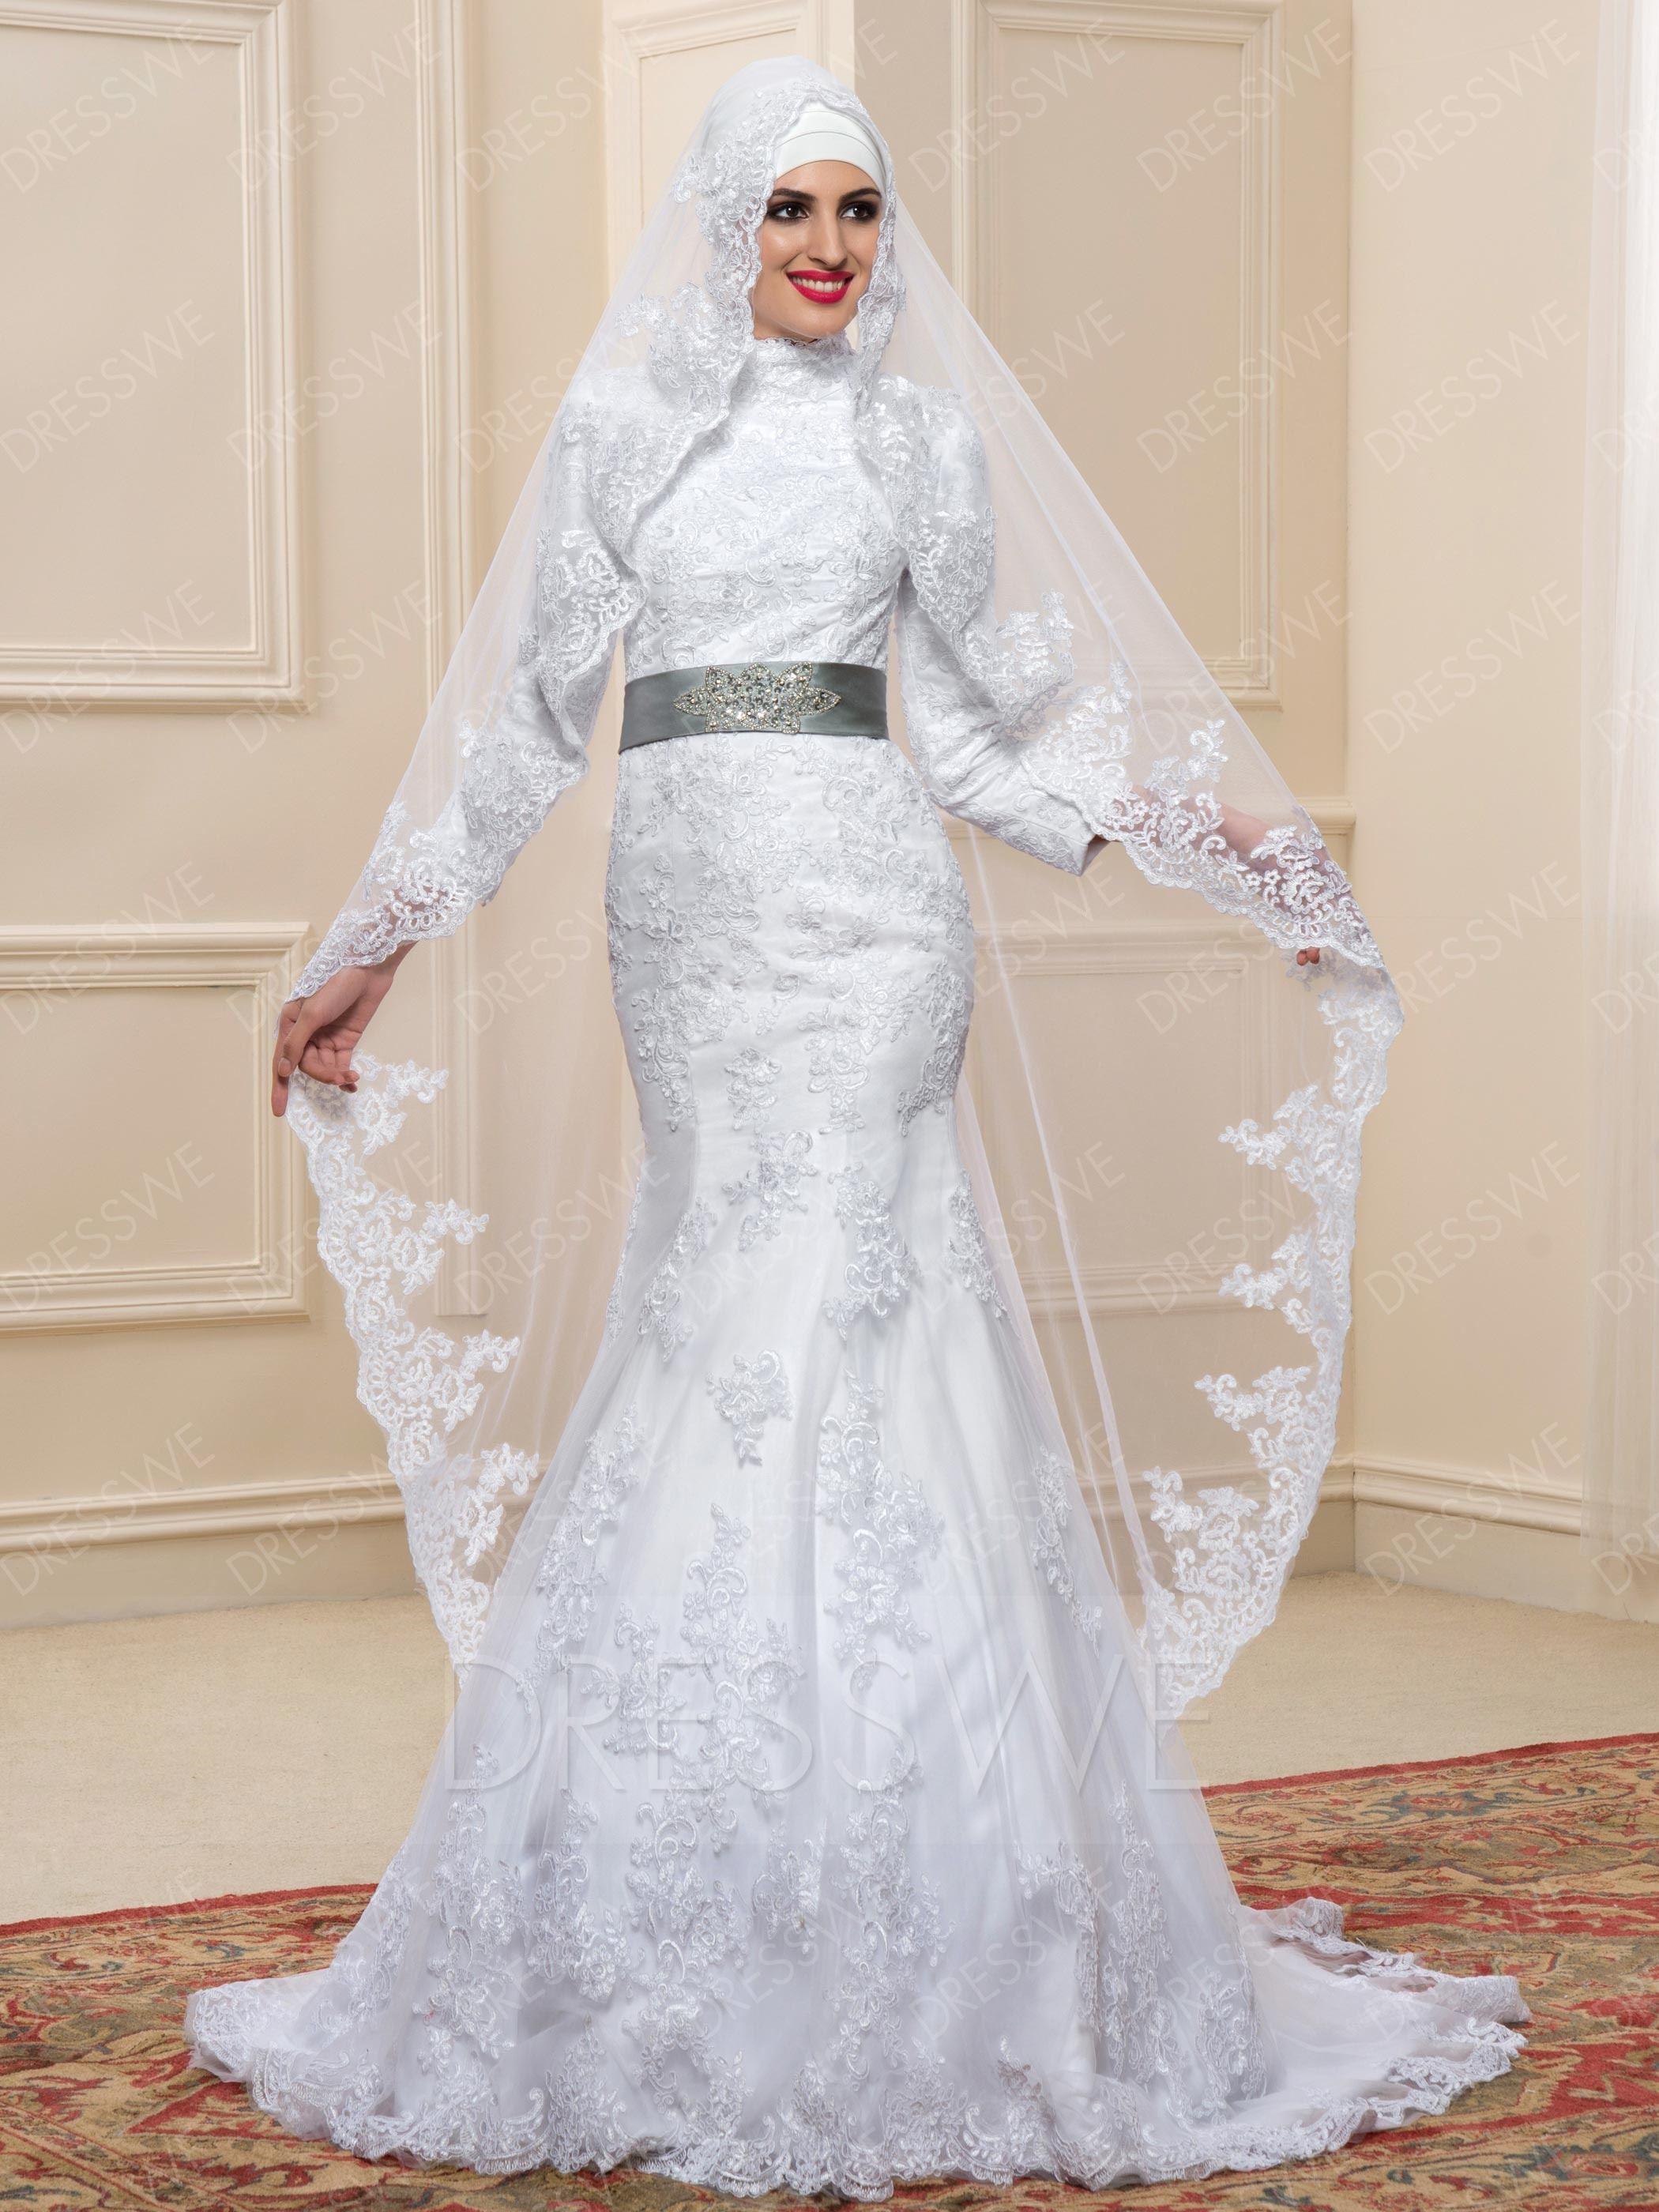 wedding dresses usa online shopping photo - 1